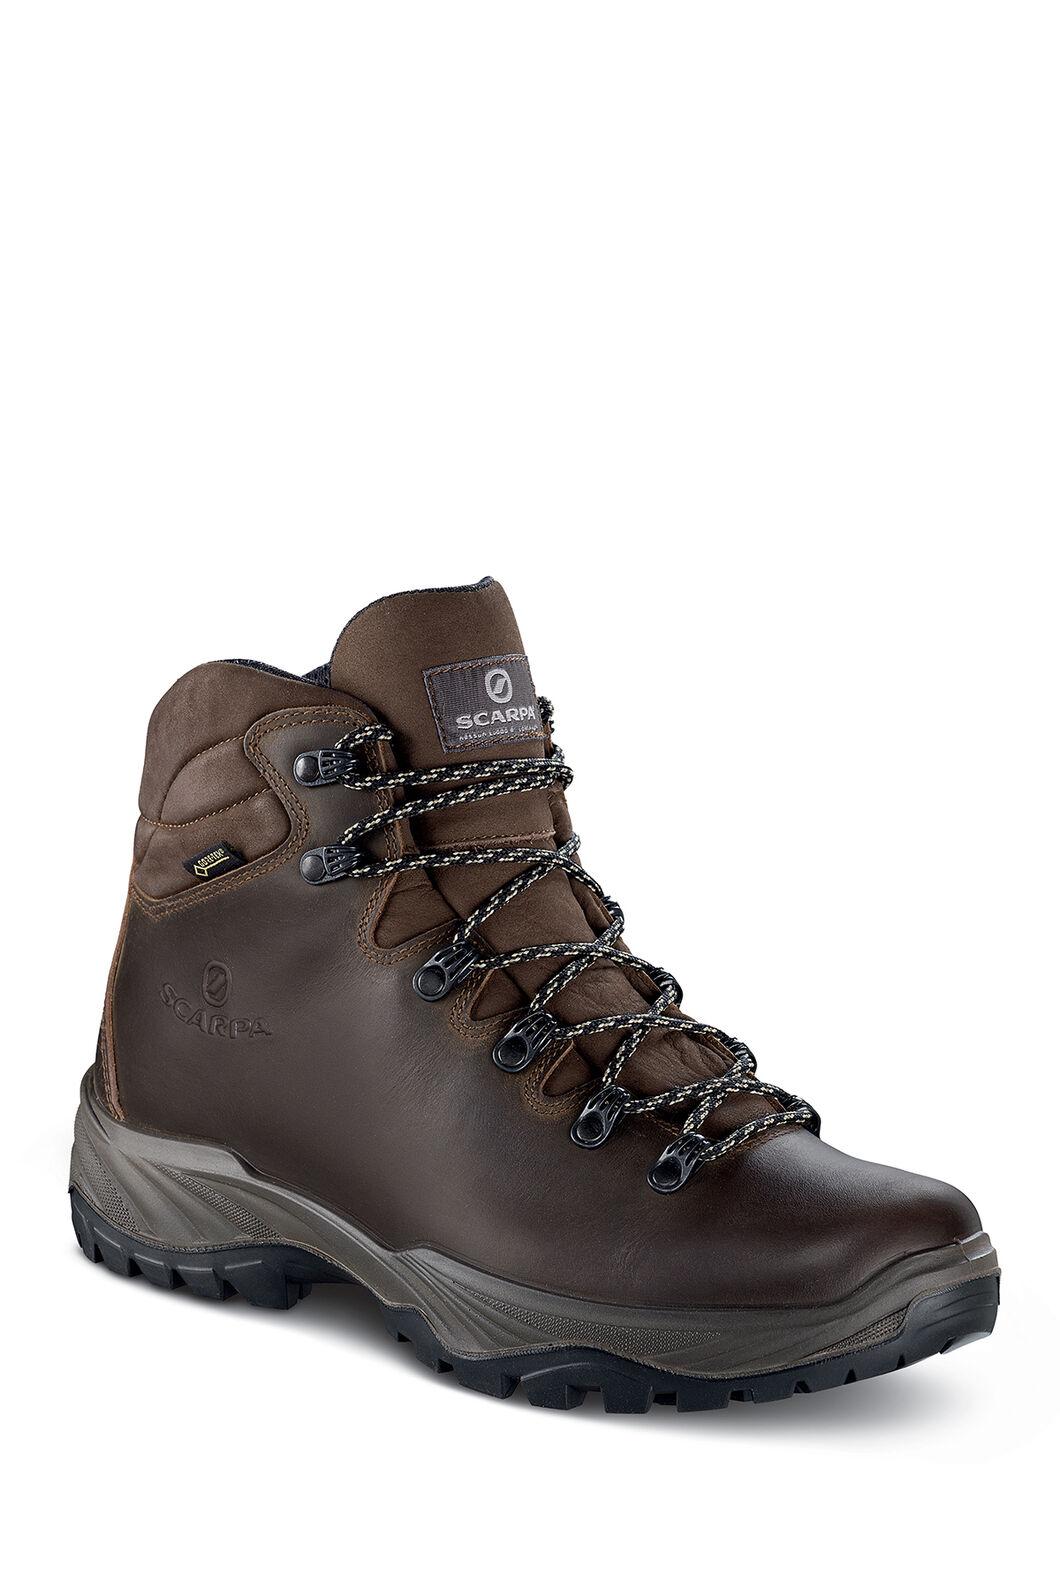 Scarpa Terra GTX Boots — Unisex, Brown, hi-res